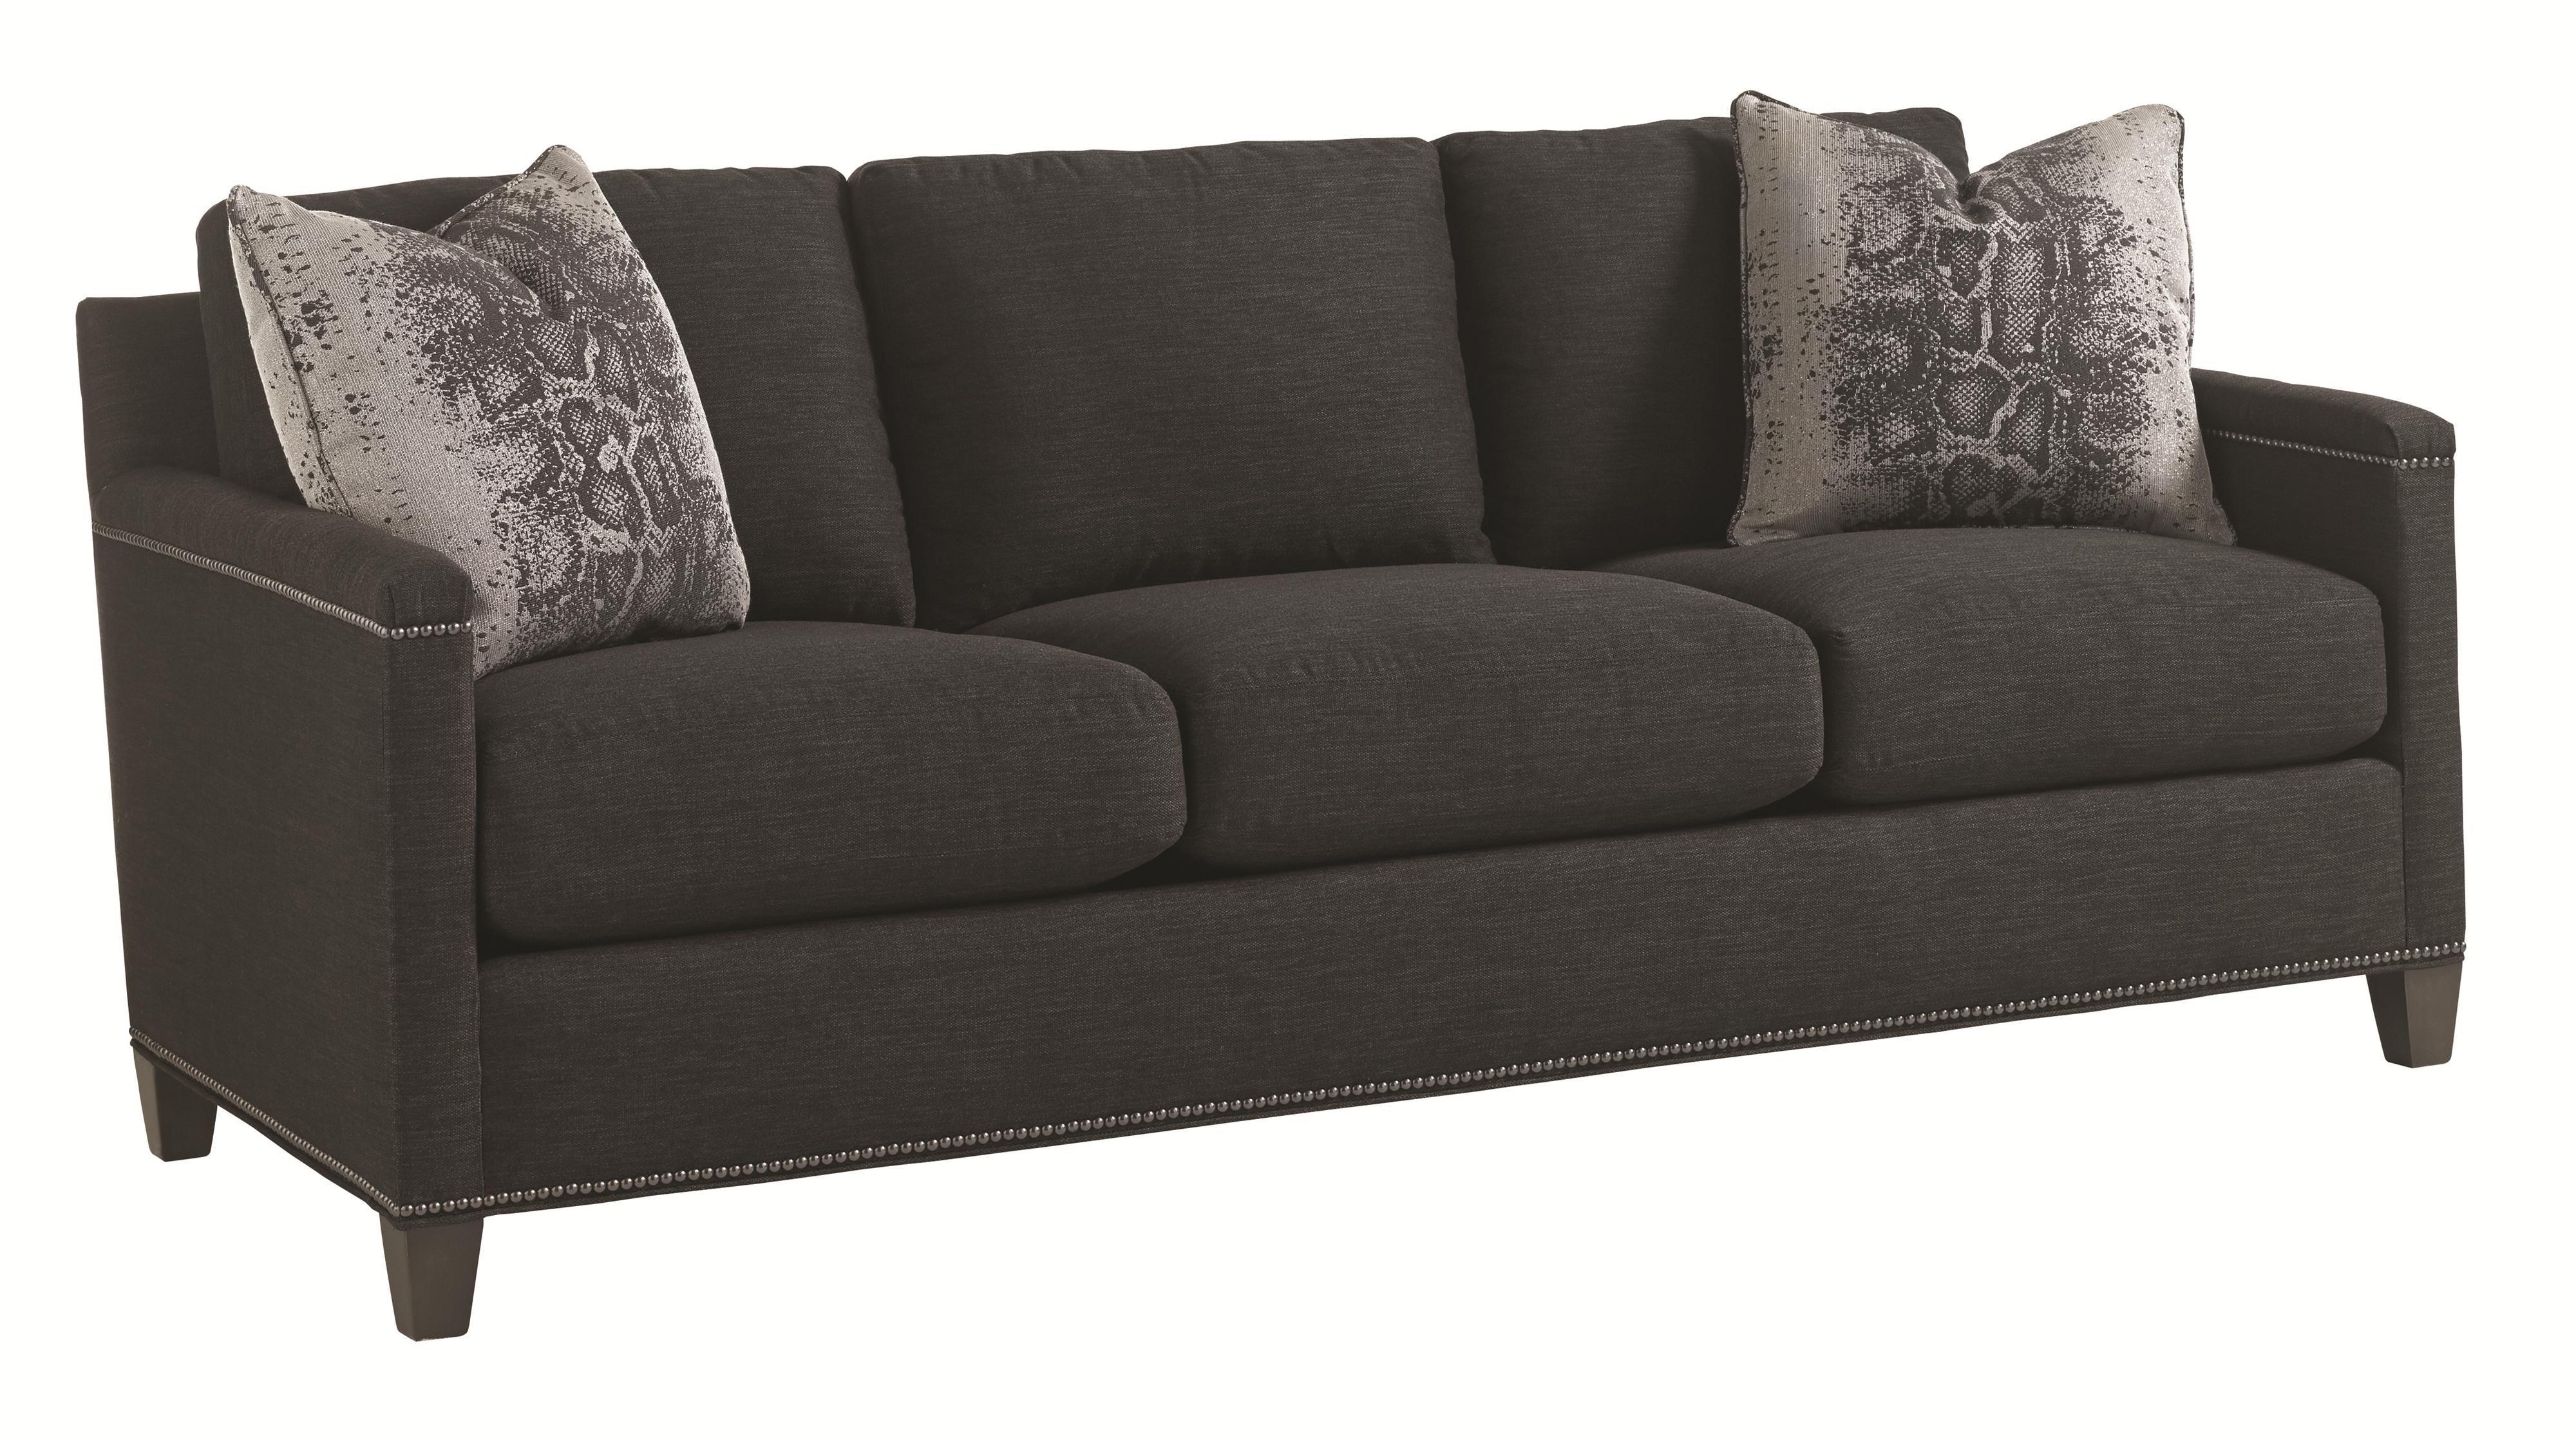 Carrera Strada Sofa by Lexington Furniture I like